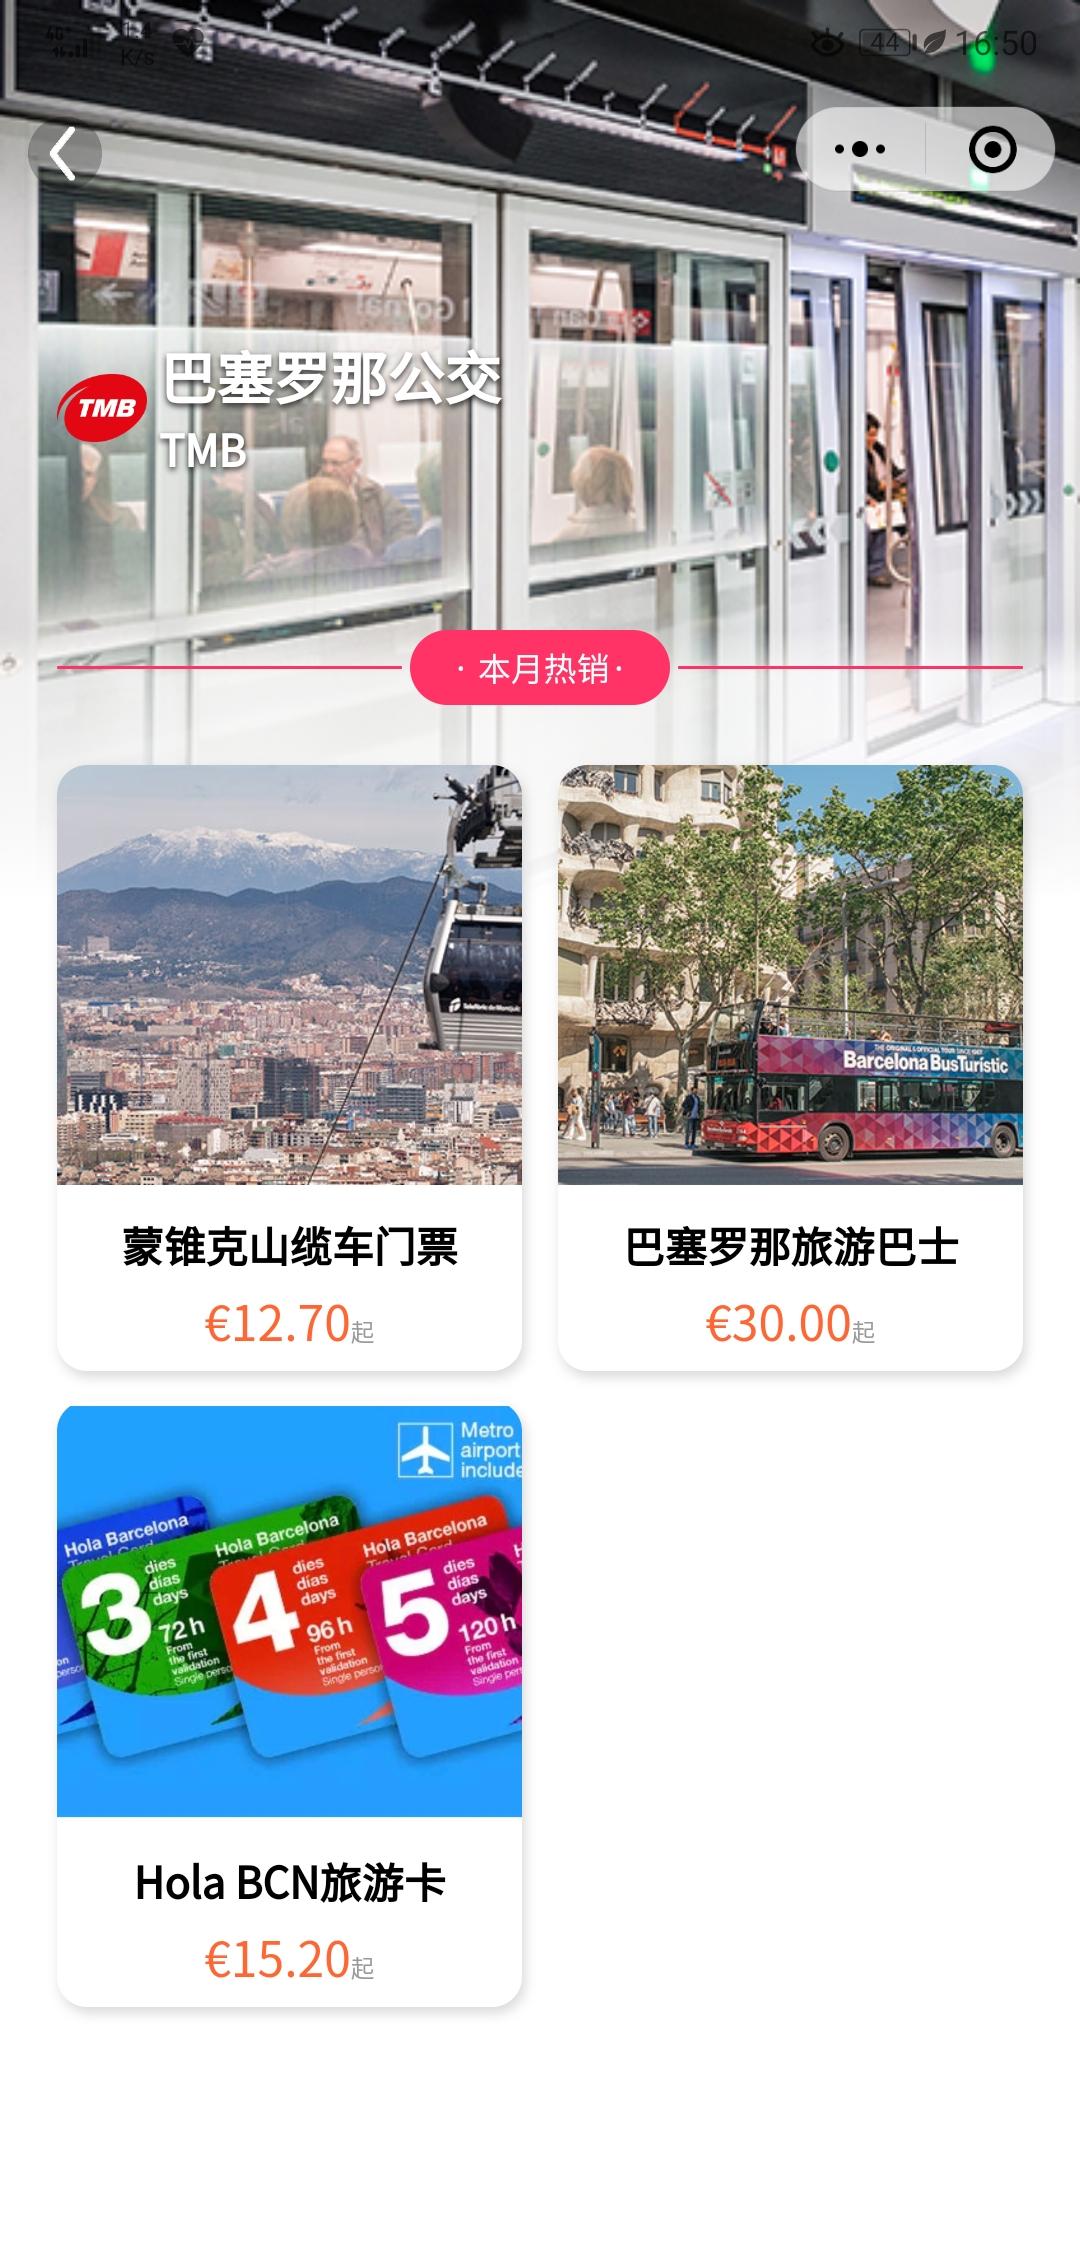 Transports Metropolitans de Barcelona WeChat Ticketing